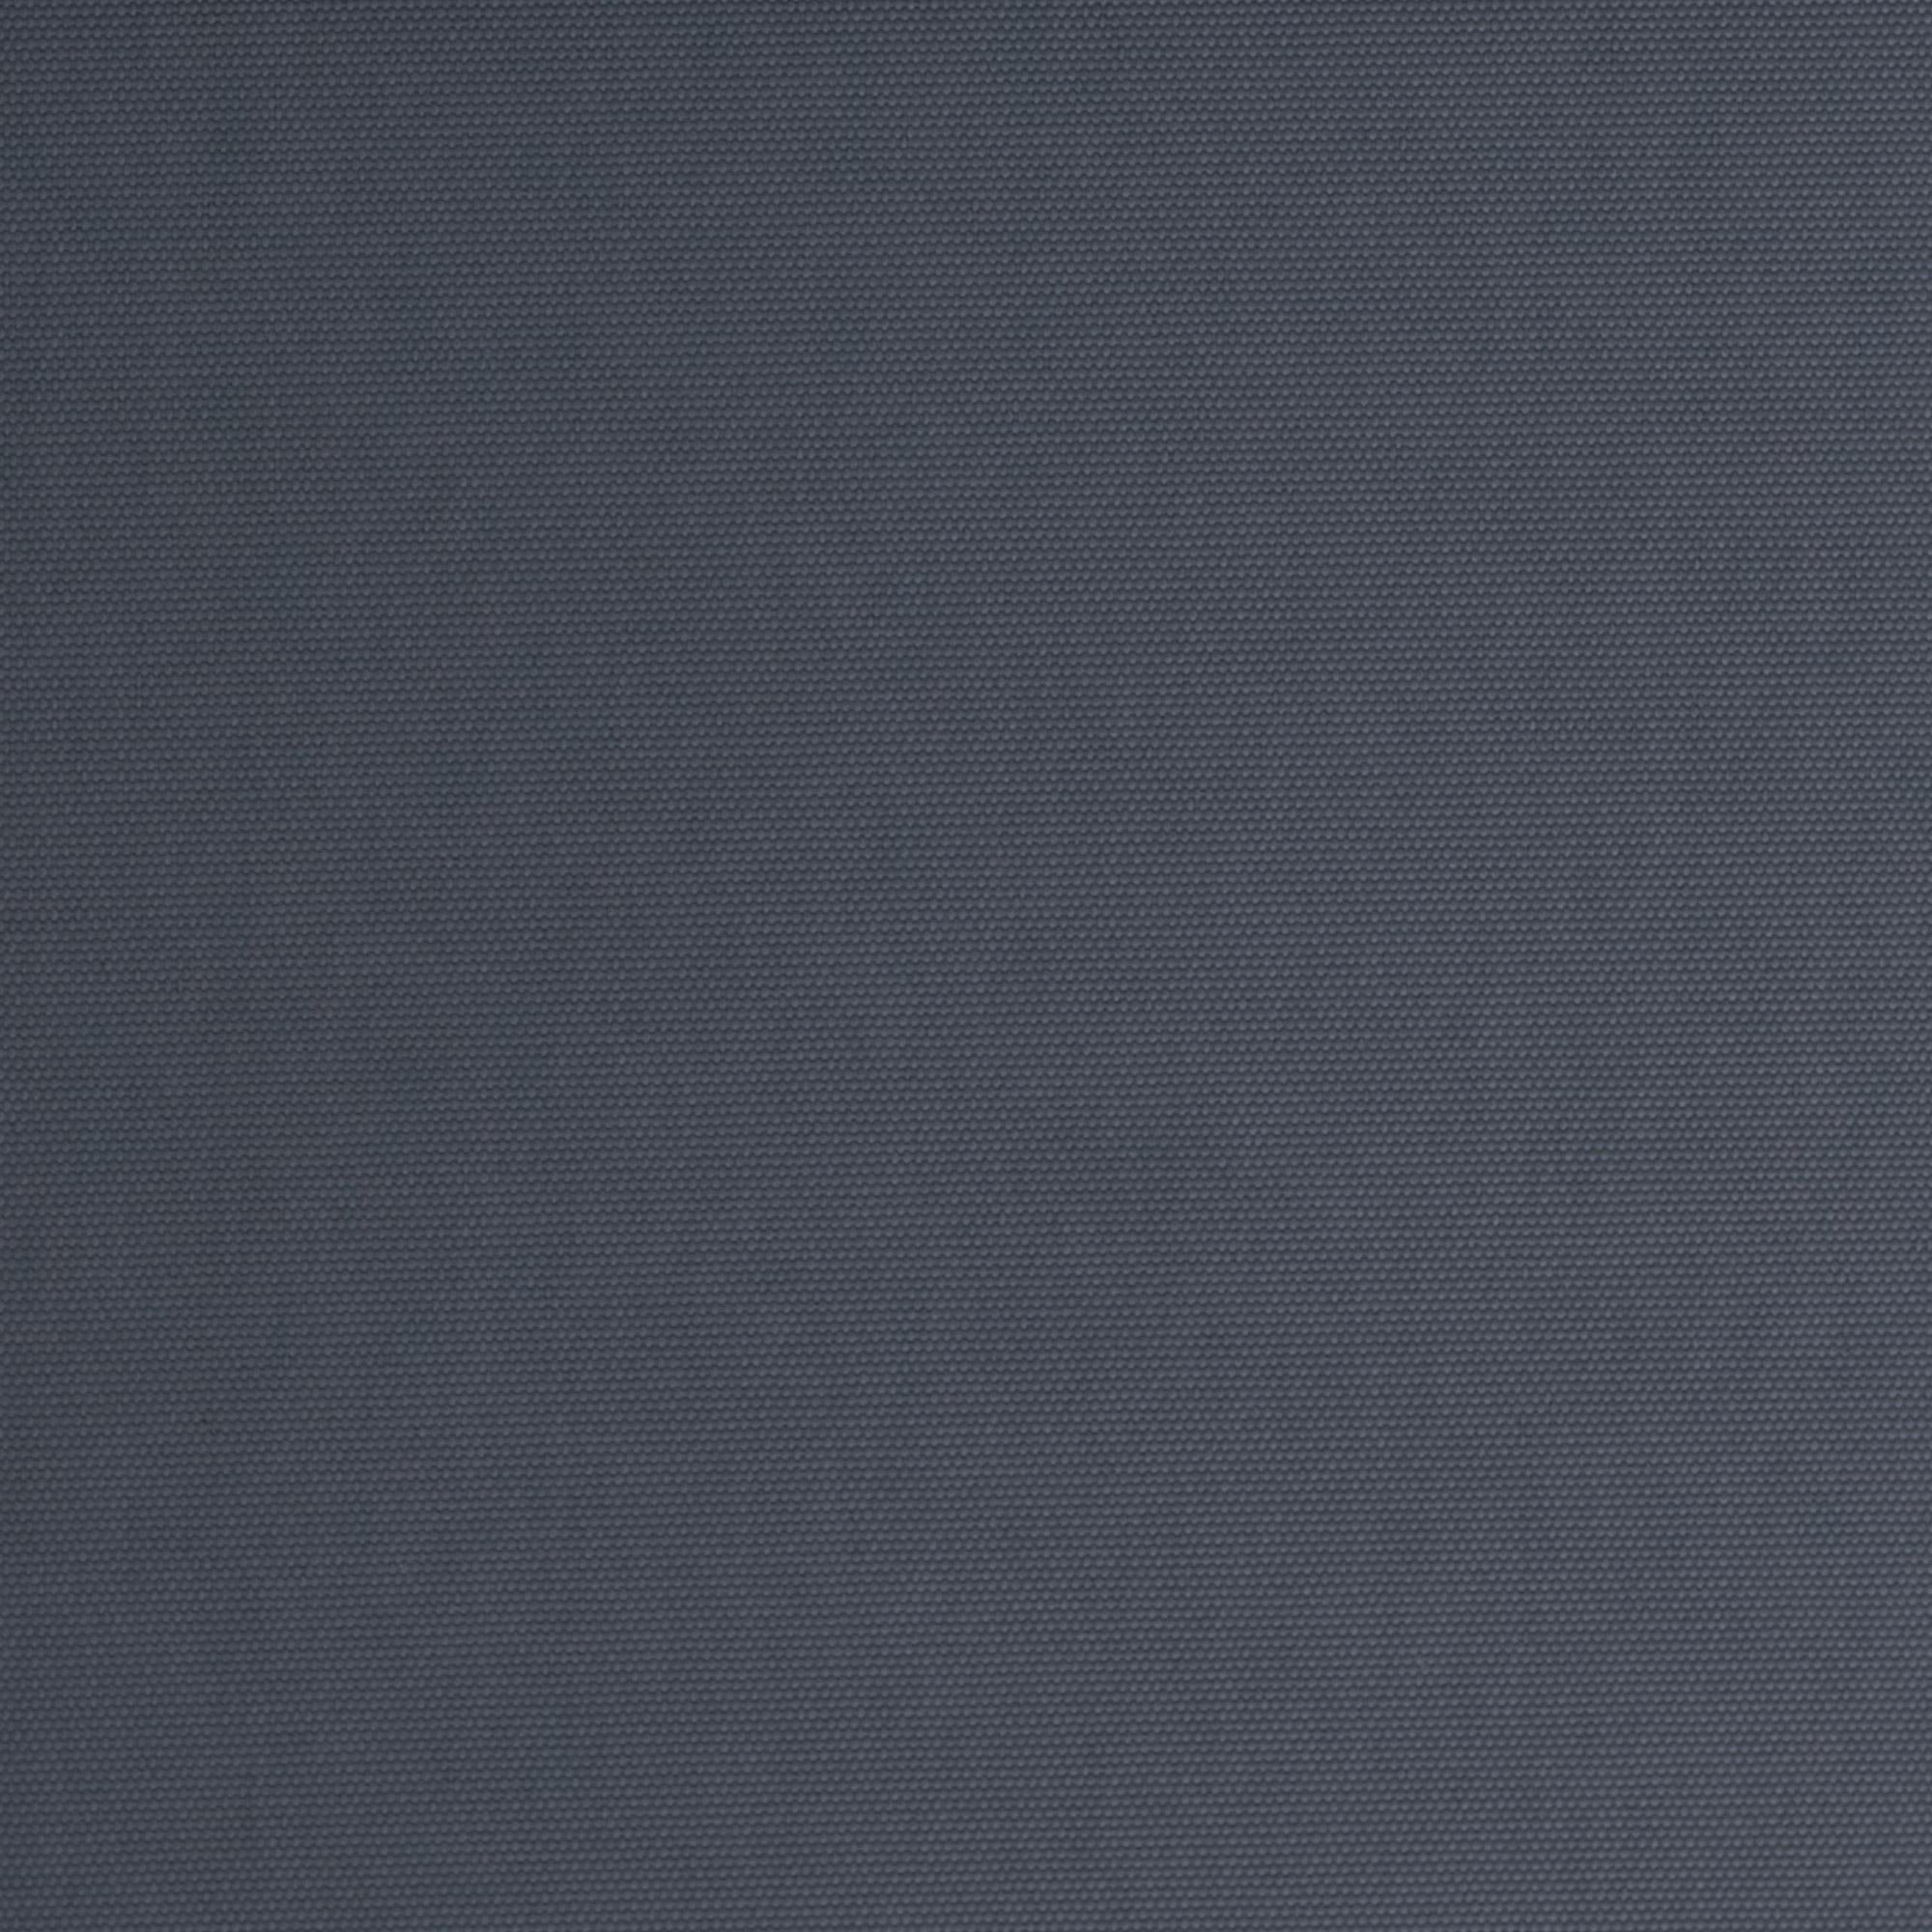 dachfenster rollo verdunkelungsrollo thermorollo verdunkelung velux ggl gpl gtl ebay. Black Bedroom Furniture Sets. Home Design Ideas